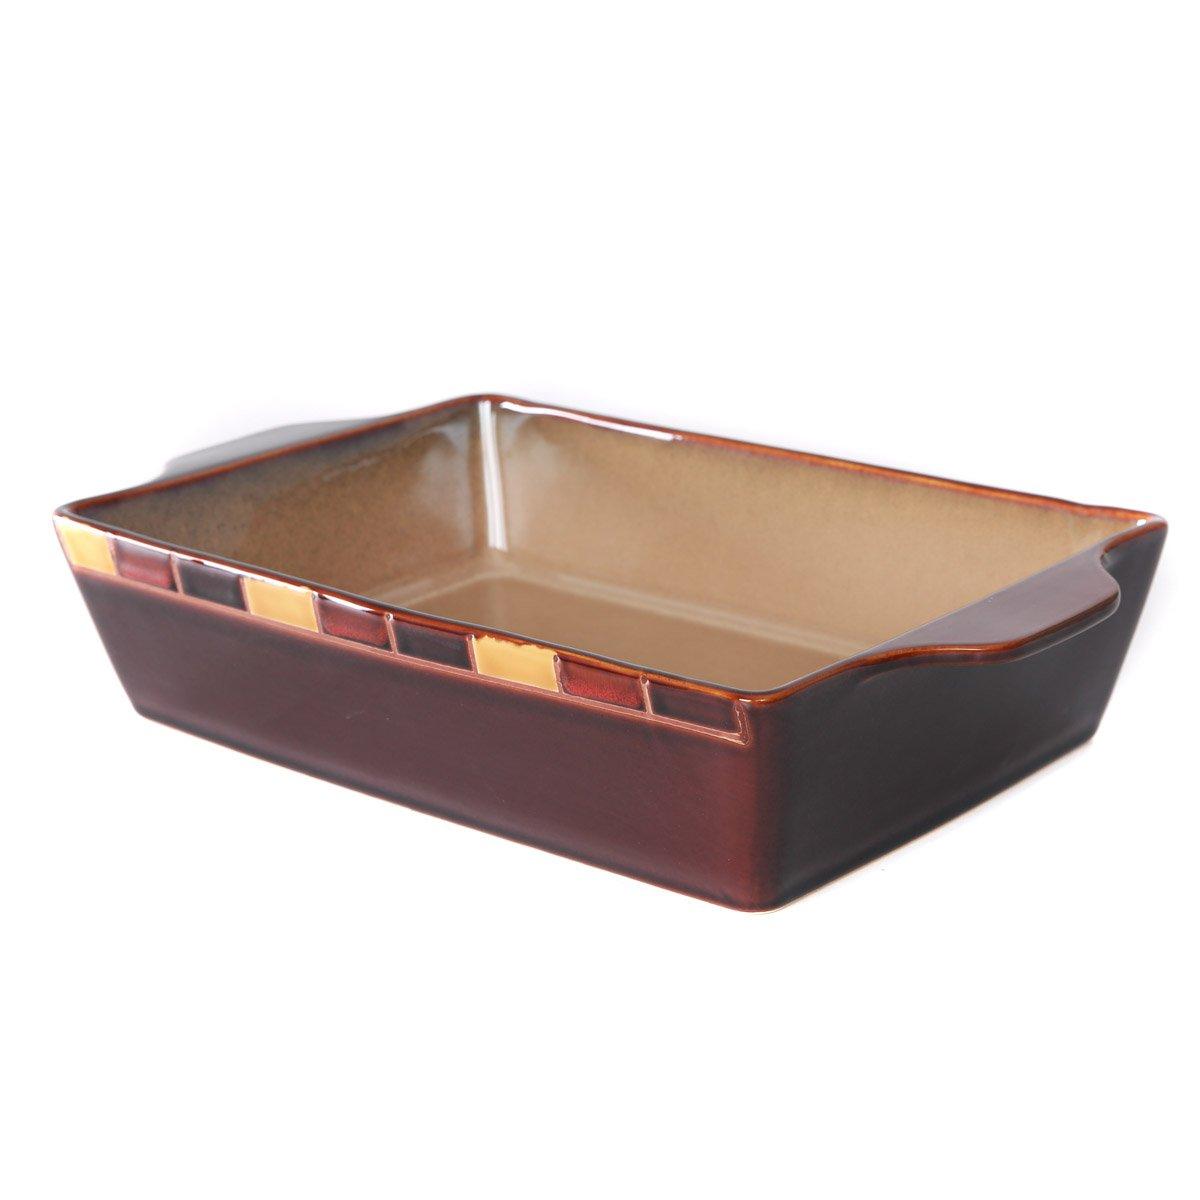 WHITEPEONY Bricks Orange Stoneware Rectangular Baker, 9-Inch x 13-Inch